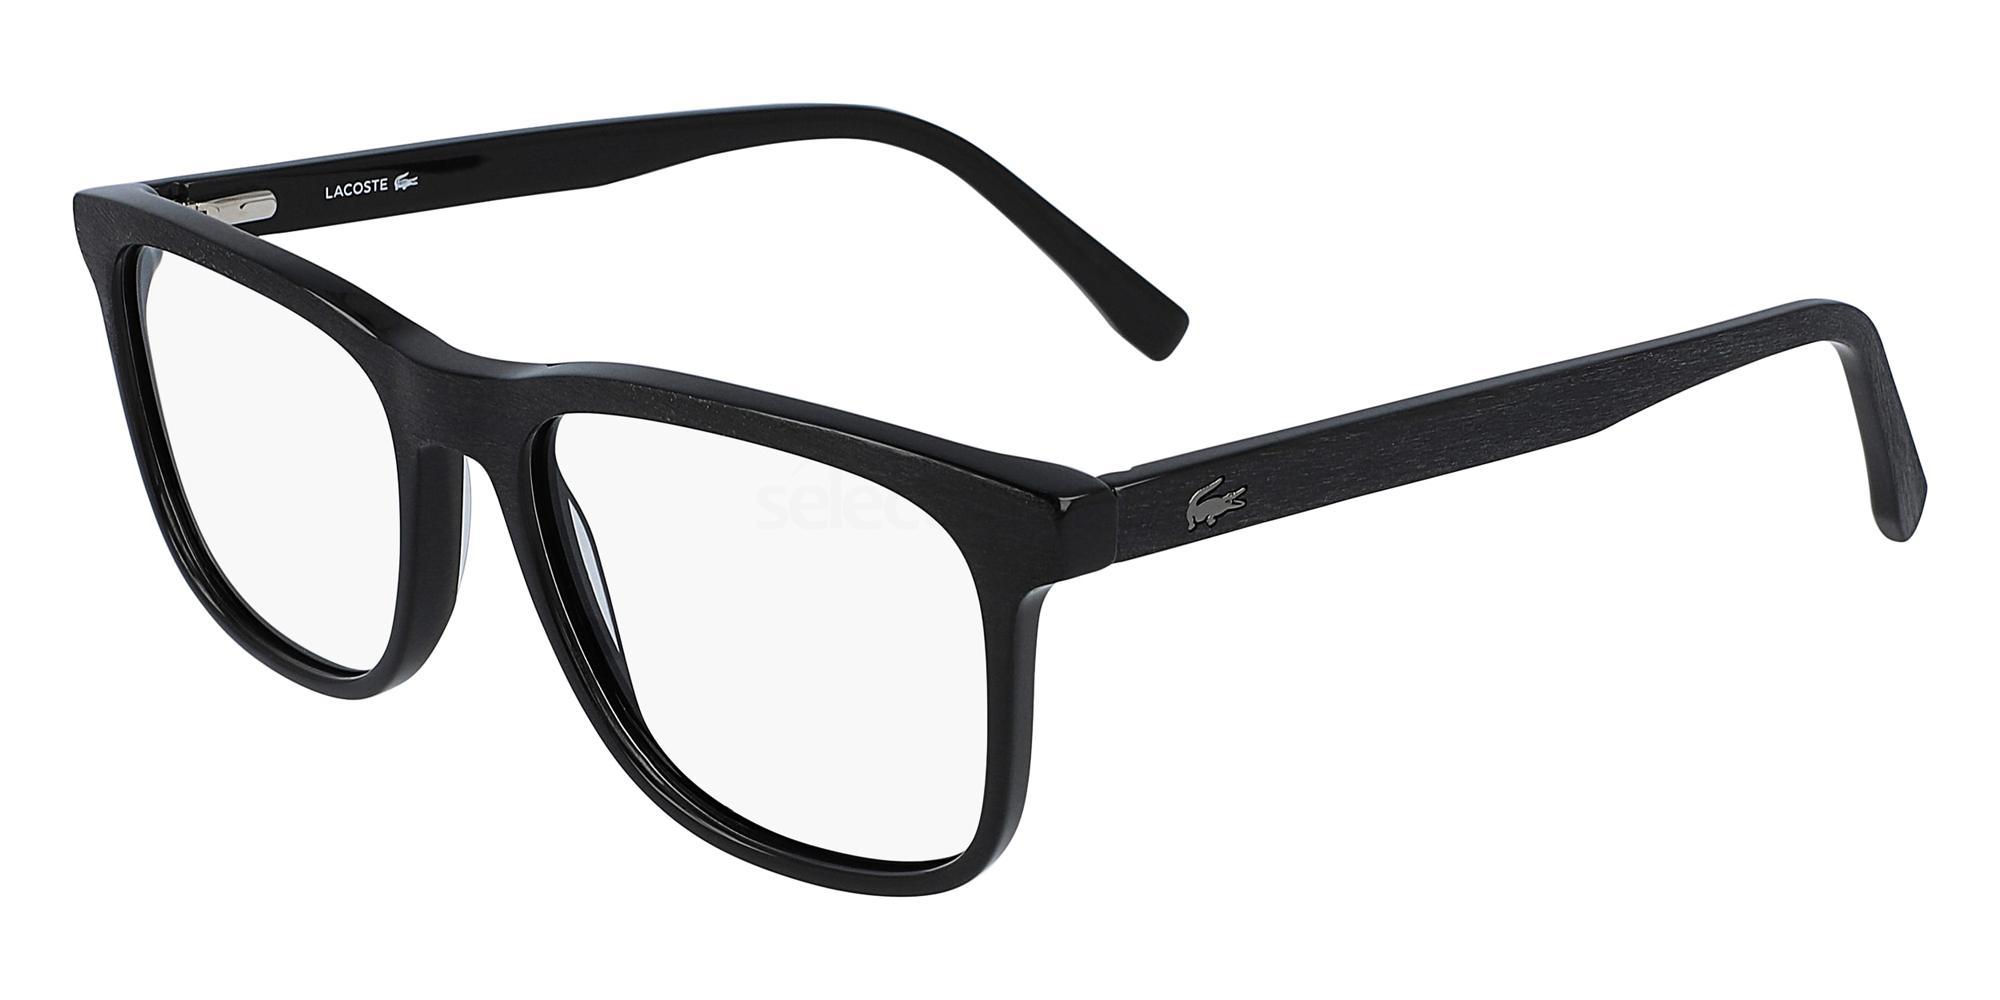 001 L2849 Glasses, Lacoste